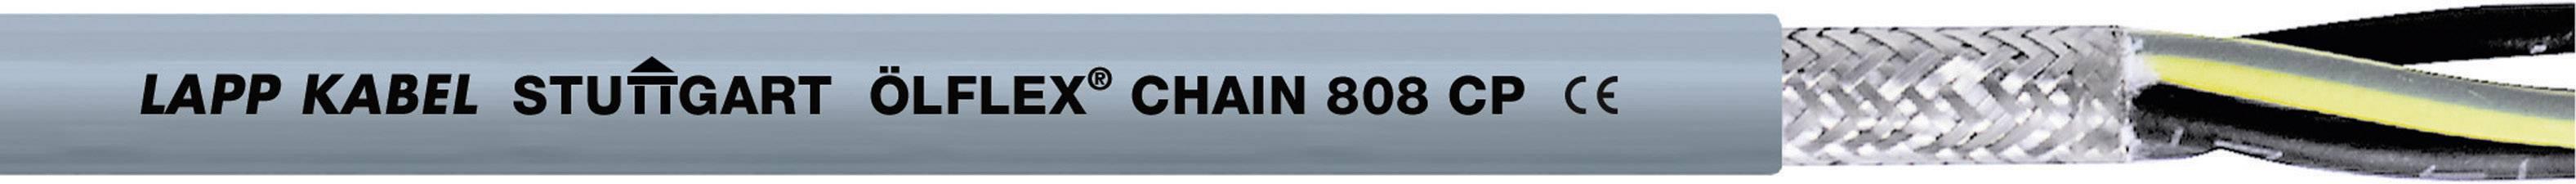 Žíla kabelu LappKabel ÖLFLEX CHAIN 808 CP 2X0,5 (1027751), 2x 0,5 mm², polyurethan, Ø 5,8 mm, stíněný, 100 m,